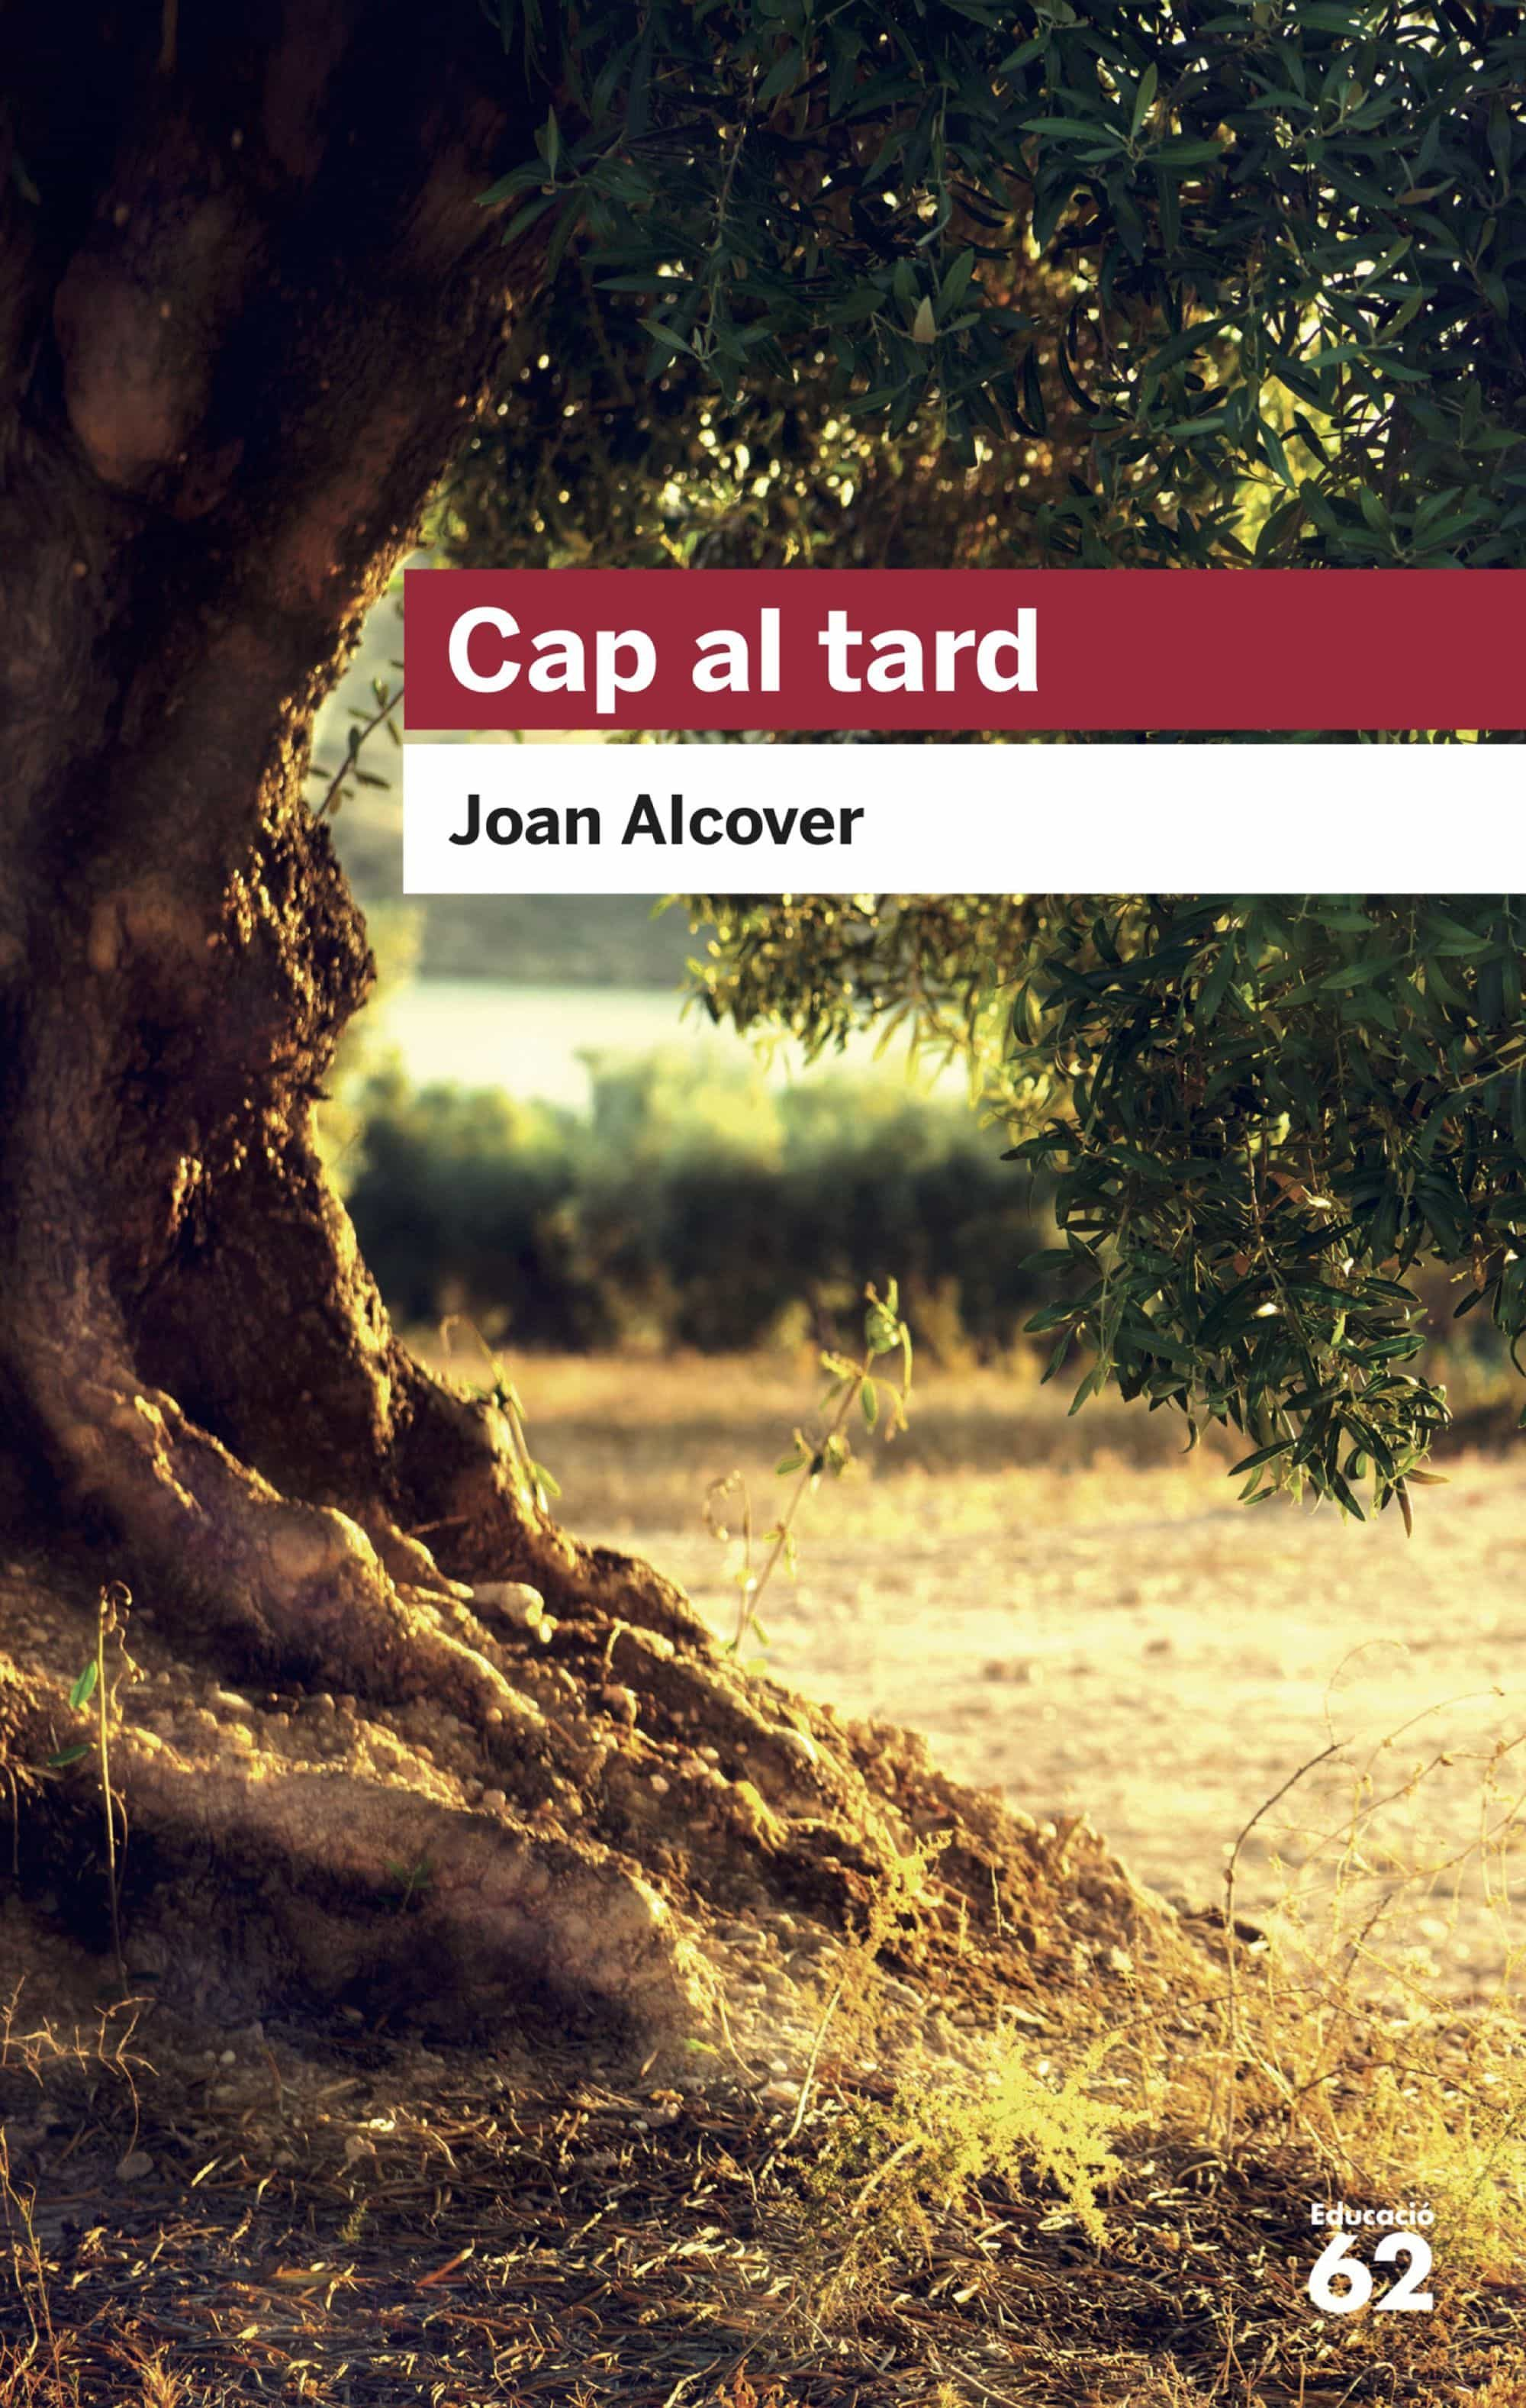 cap al tard-joan alcover-9788492672295